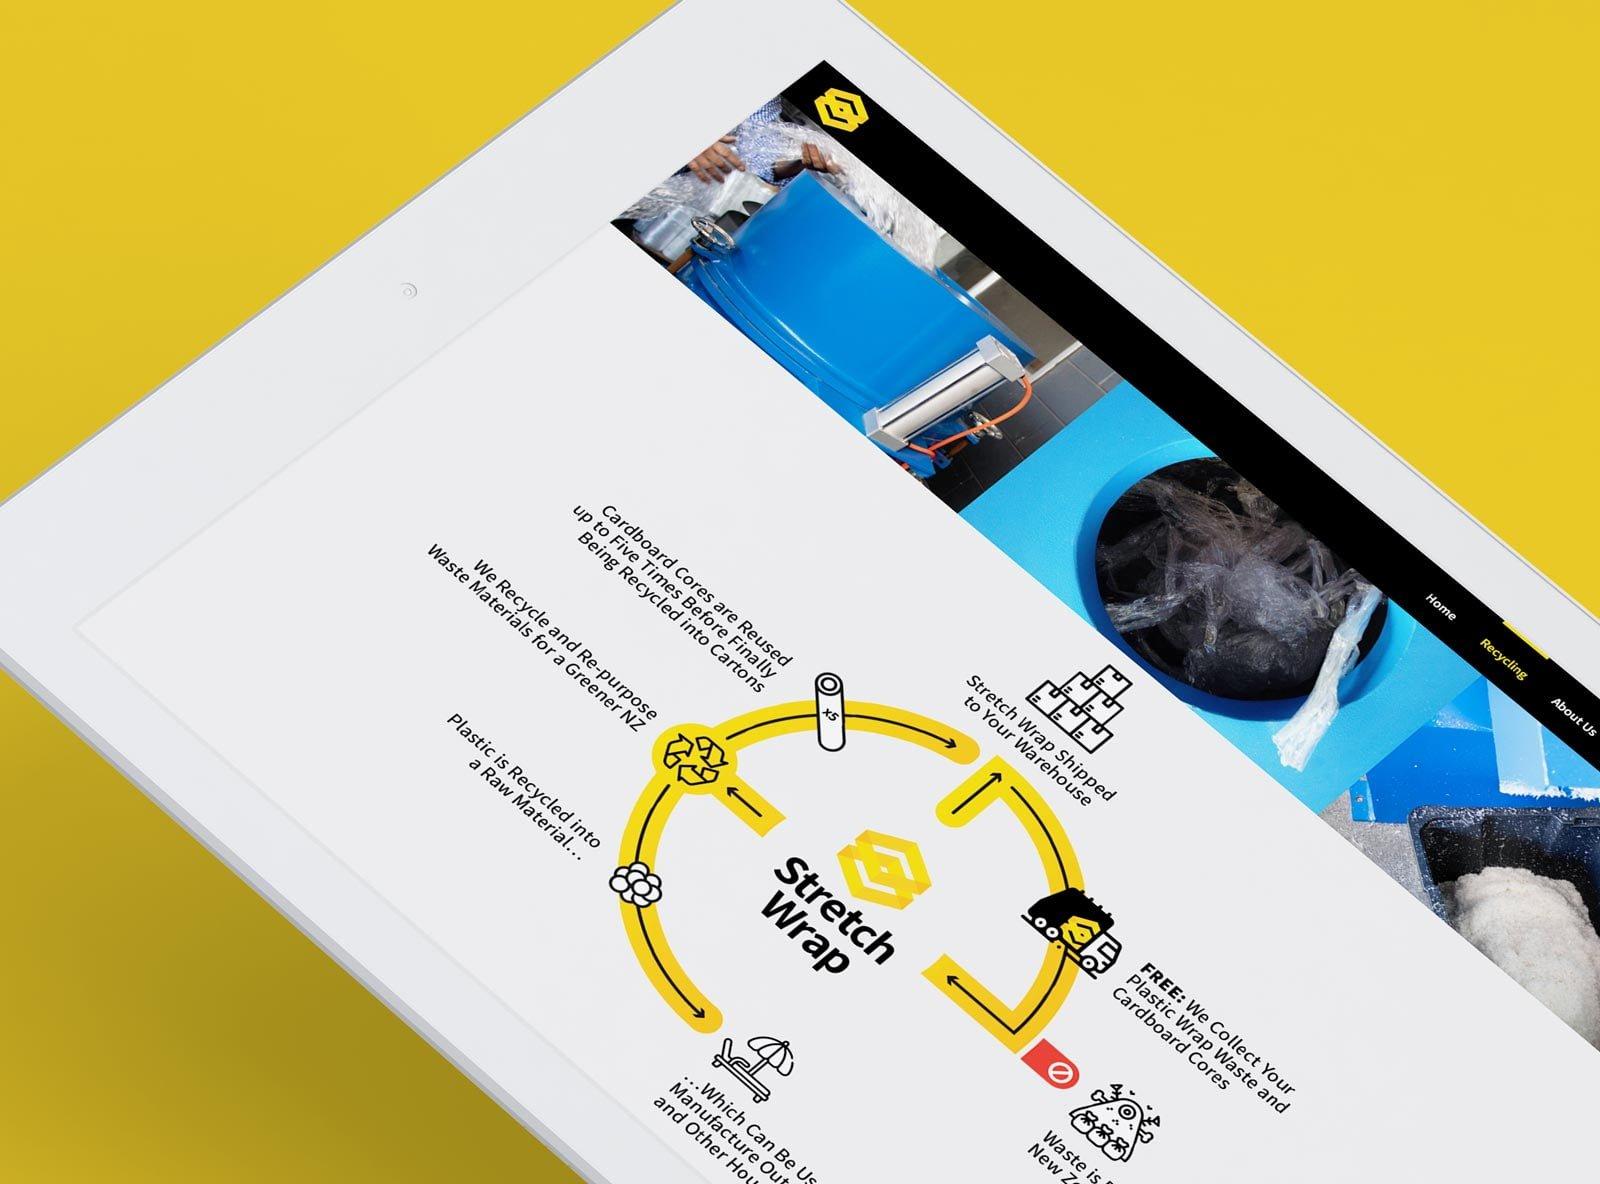 infographic-design-content-creation-stretch-alt